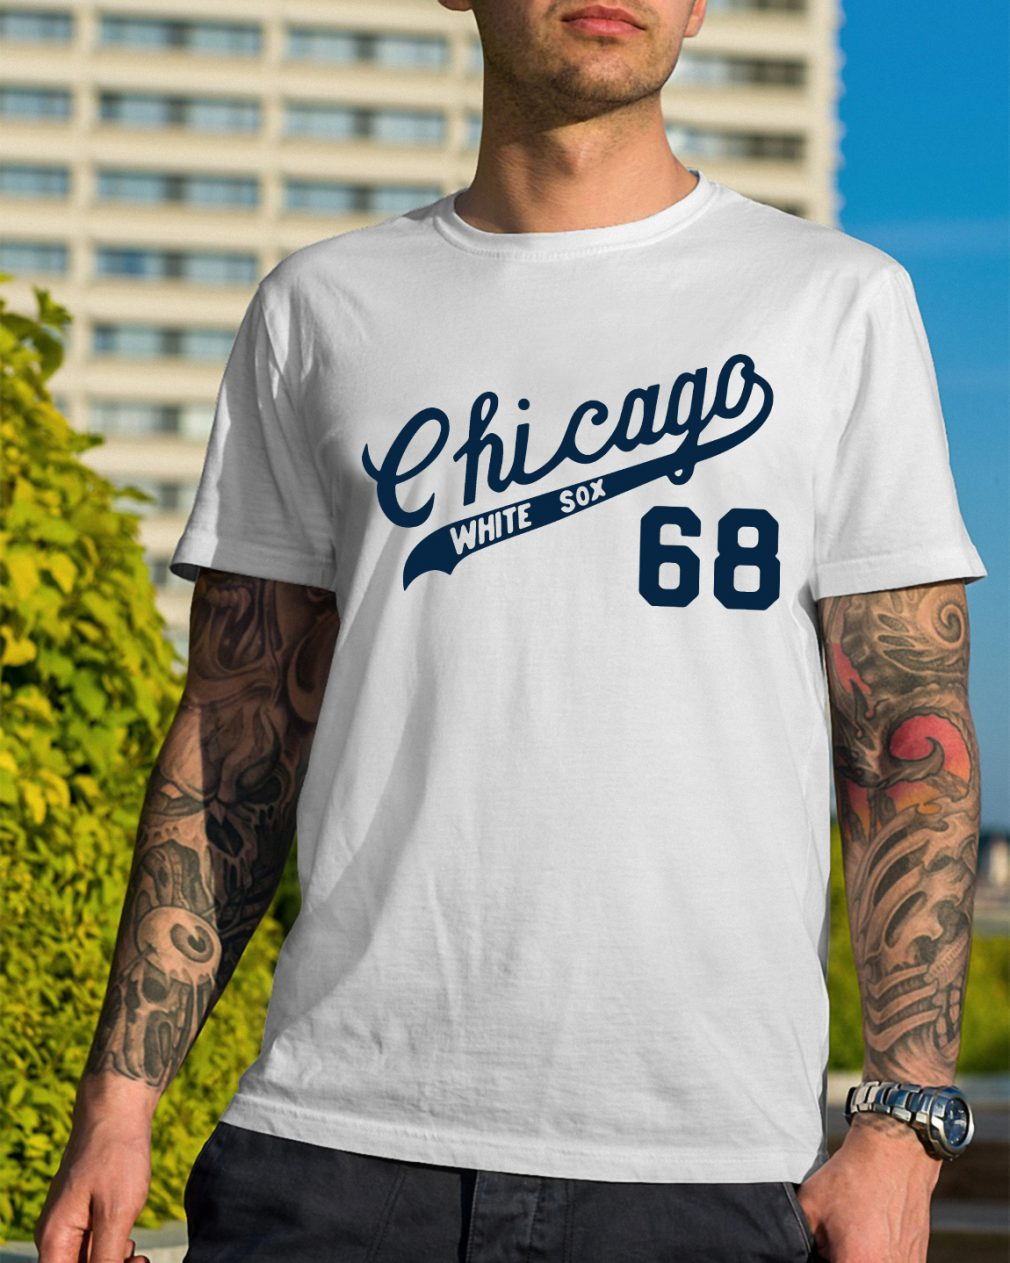 Chicago White Sox 68 Shirt